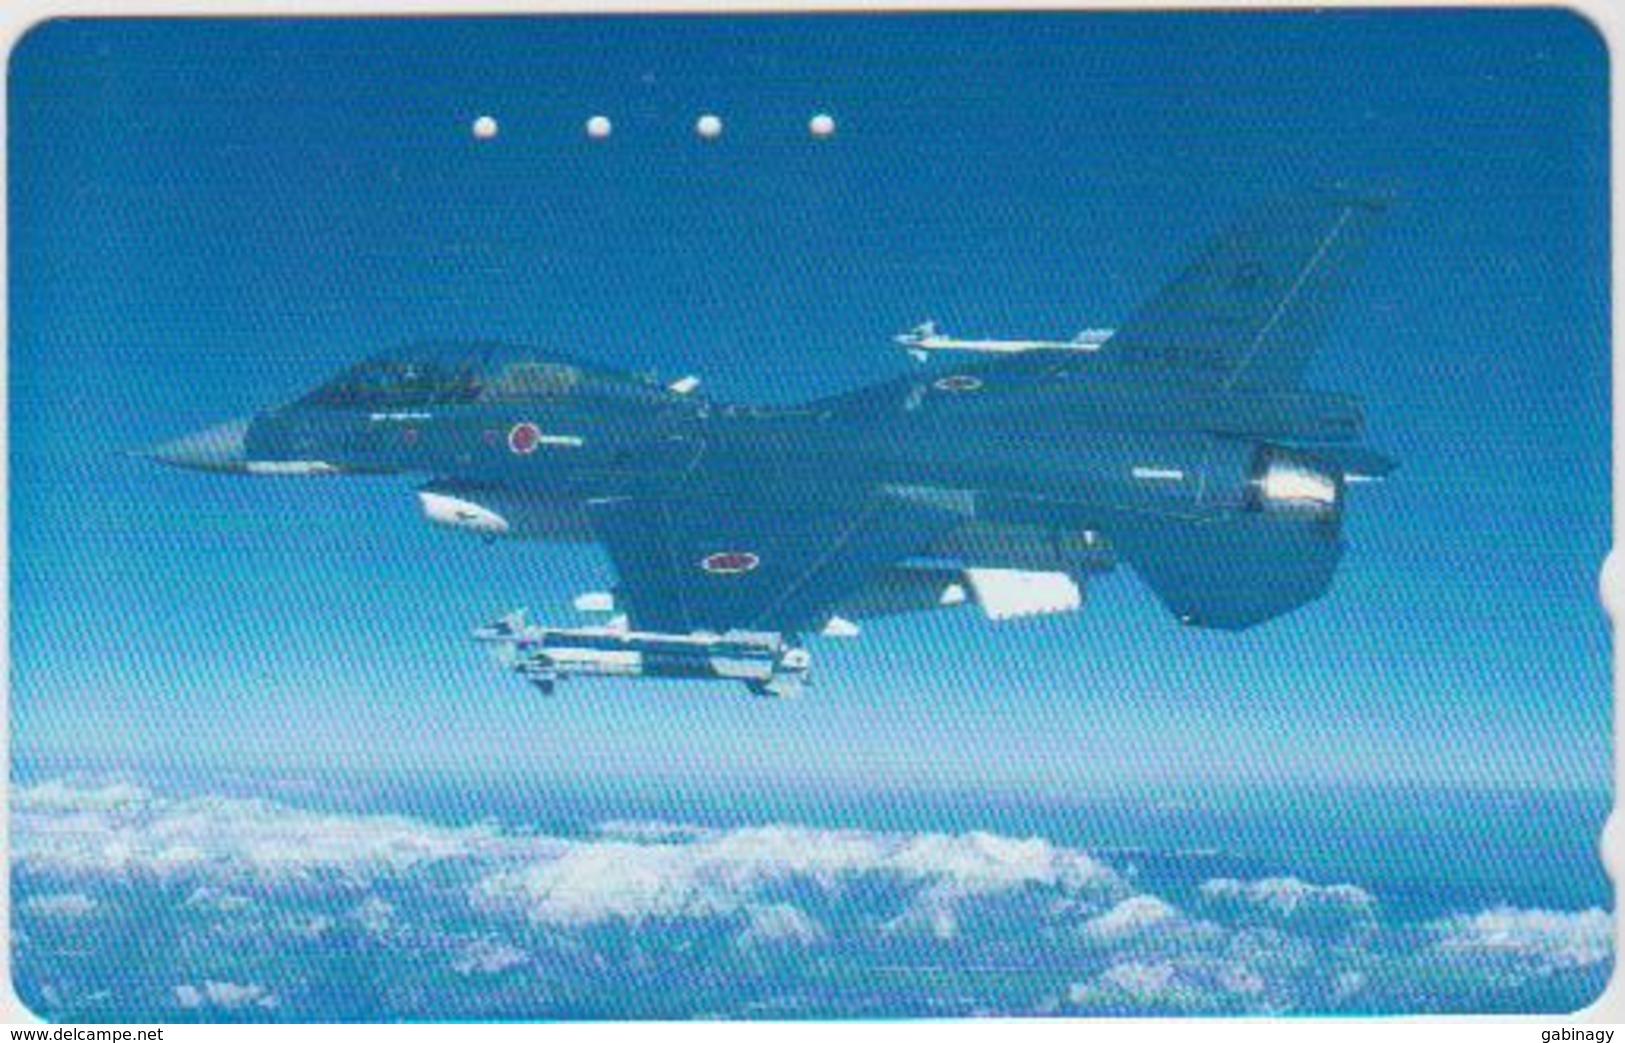 AIRPLANE - JAPAN-241 - MILITARY - Avions